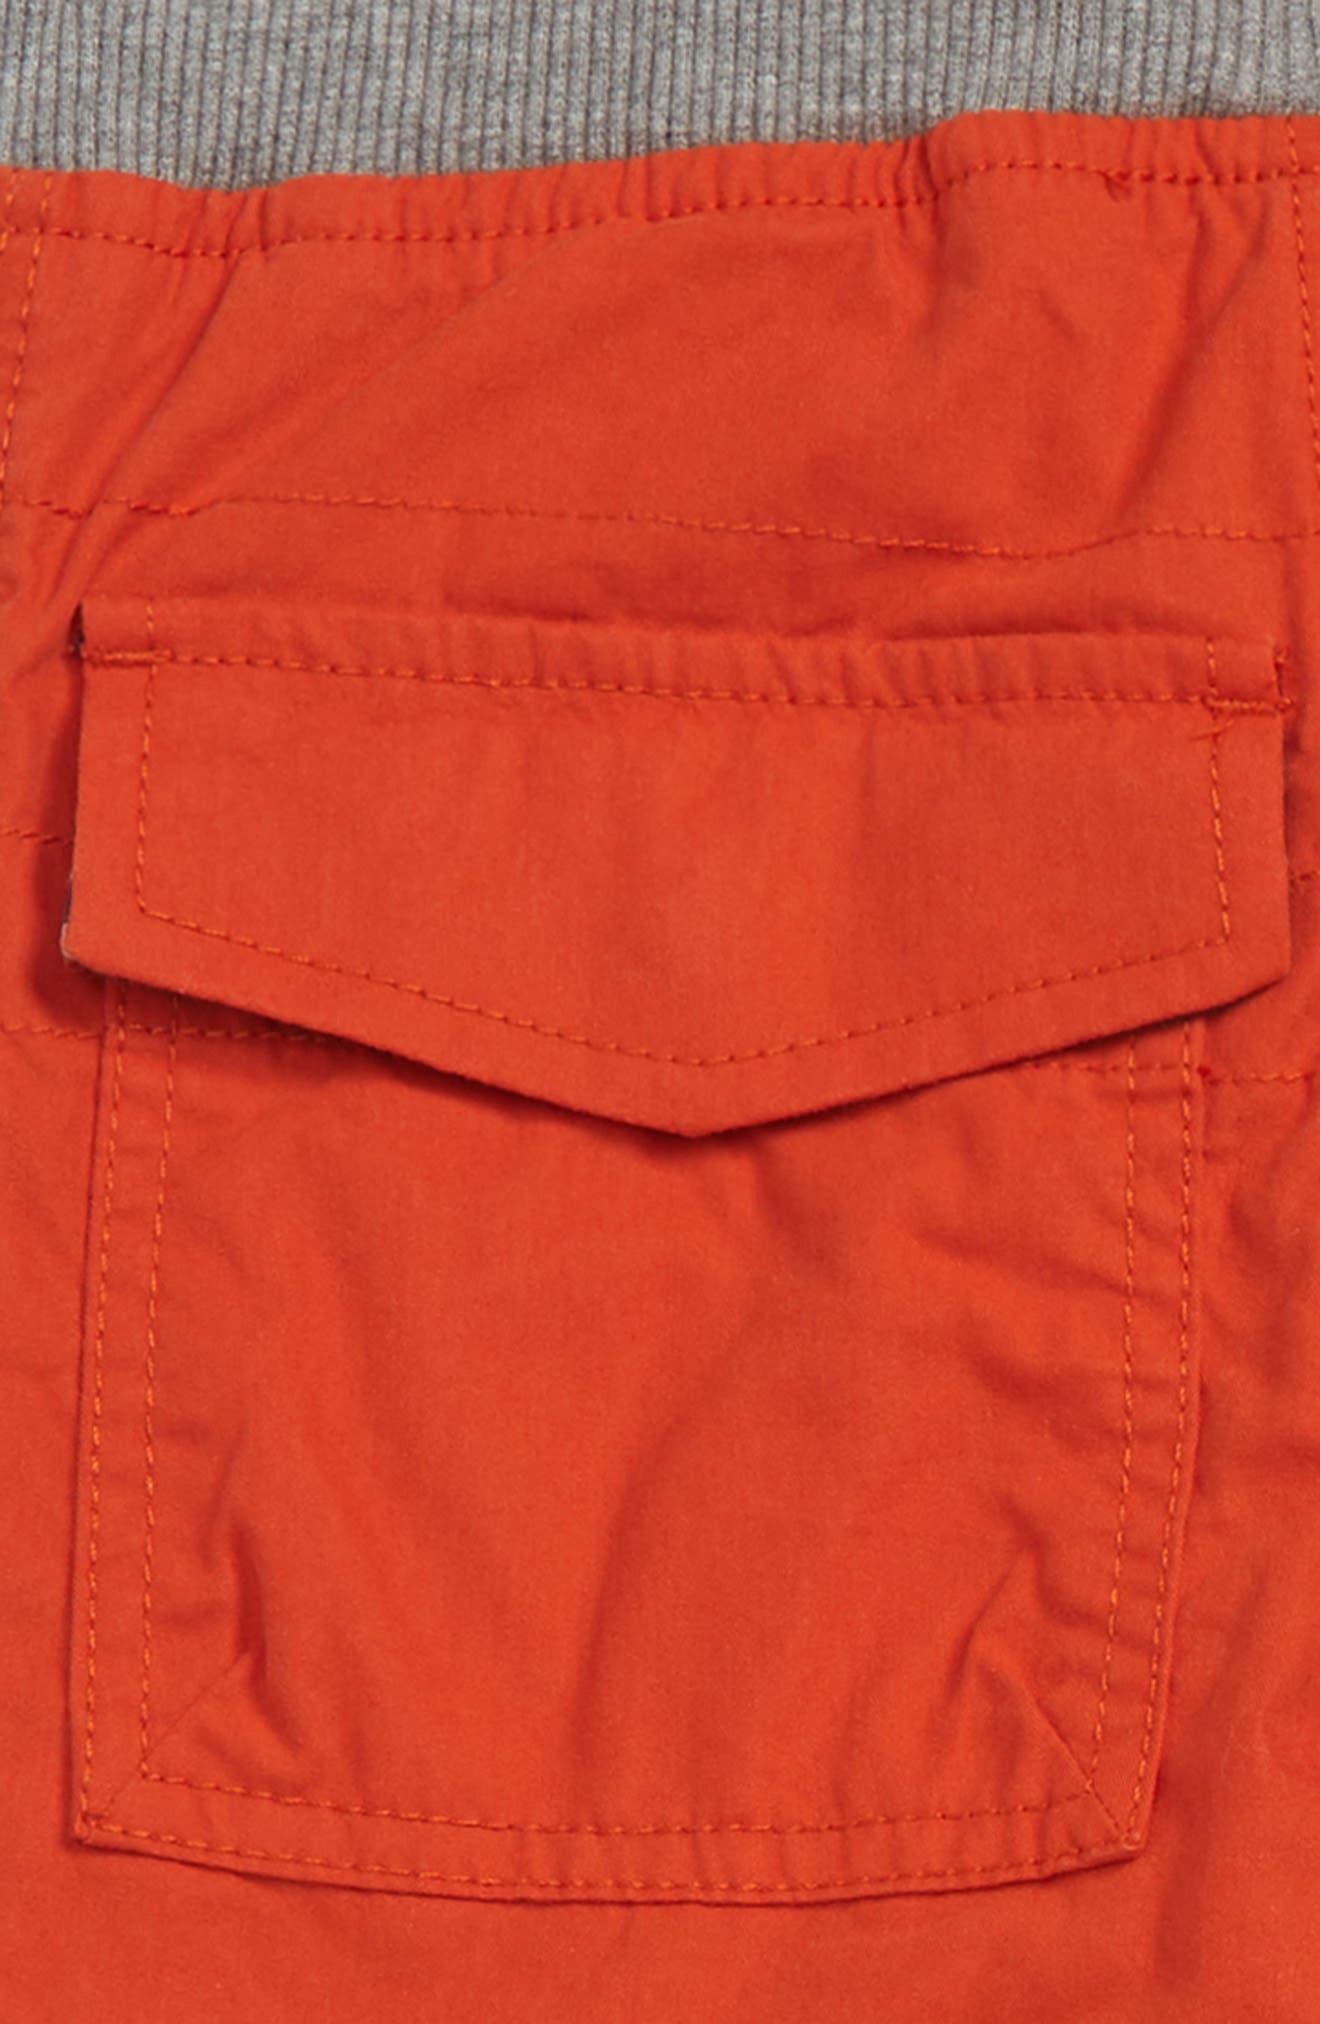 Cargo Pull On Pants,                             Alternate thumbnail 3, color,                             LAVA ORANGE